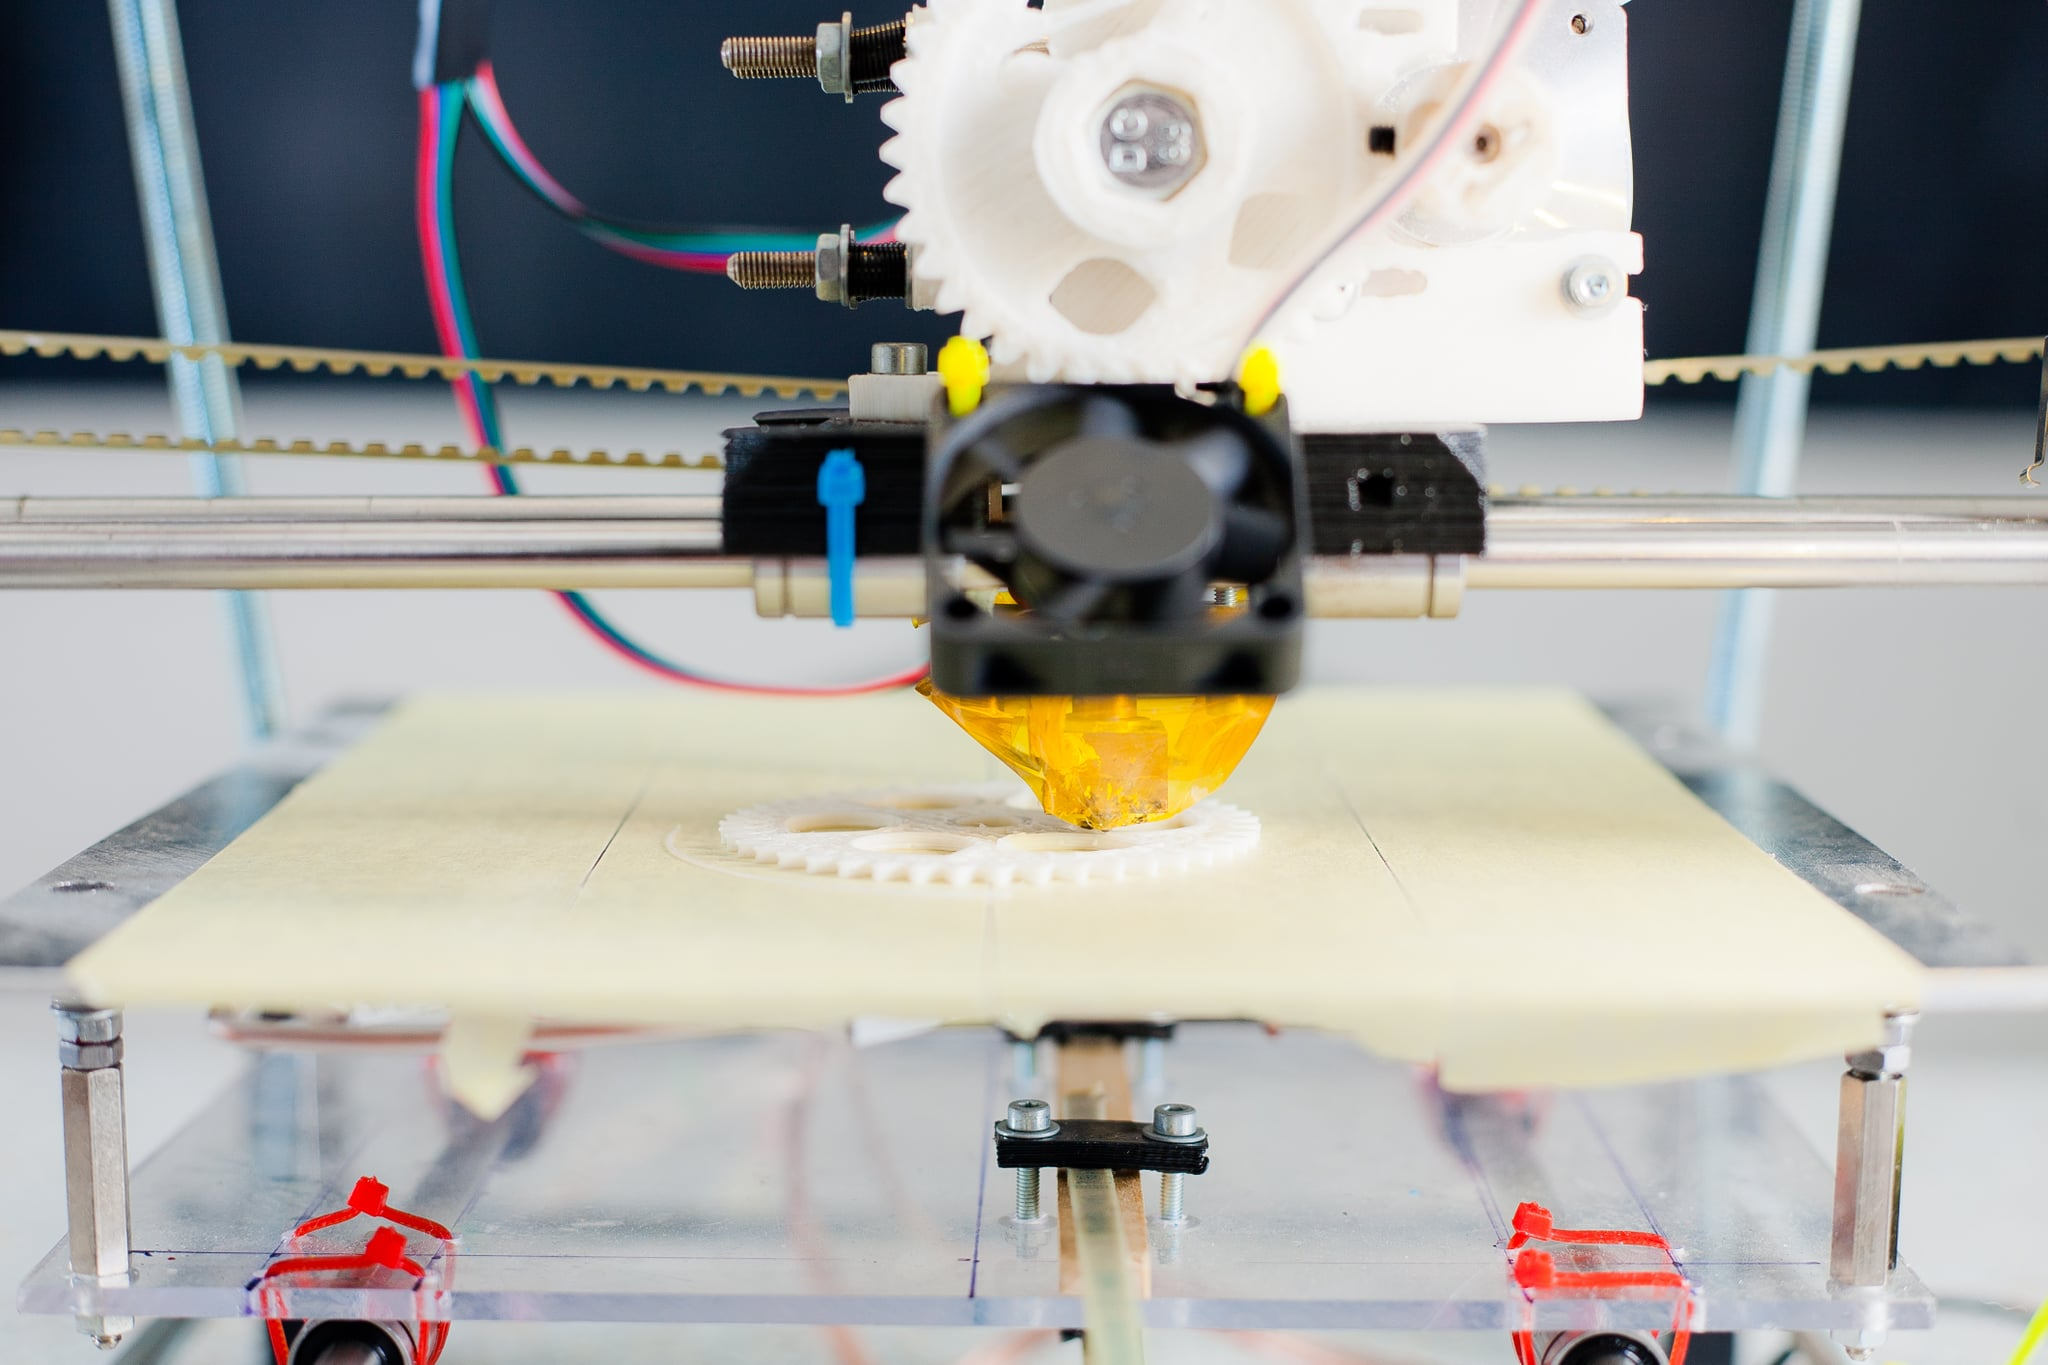 How 3D Printers Are Revolutionizing Medicine